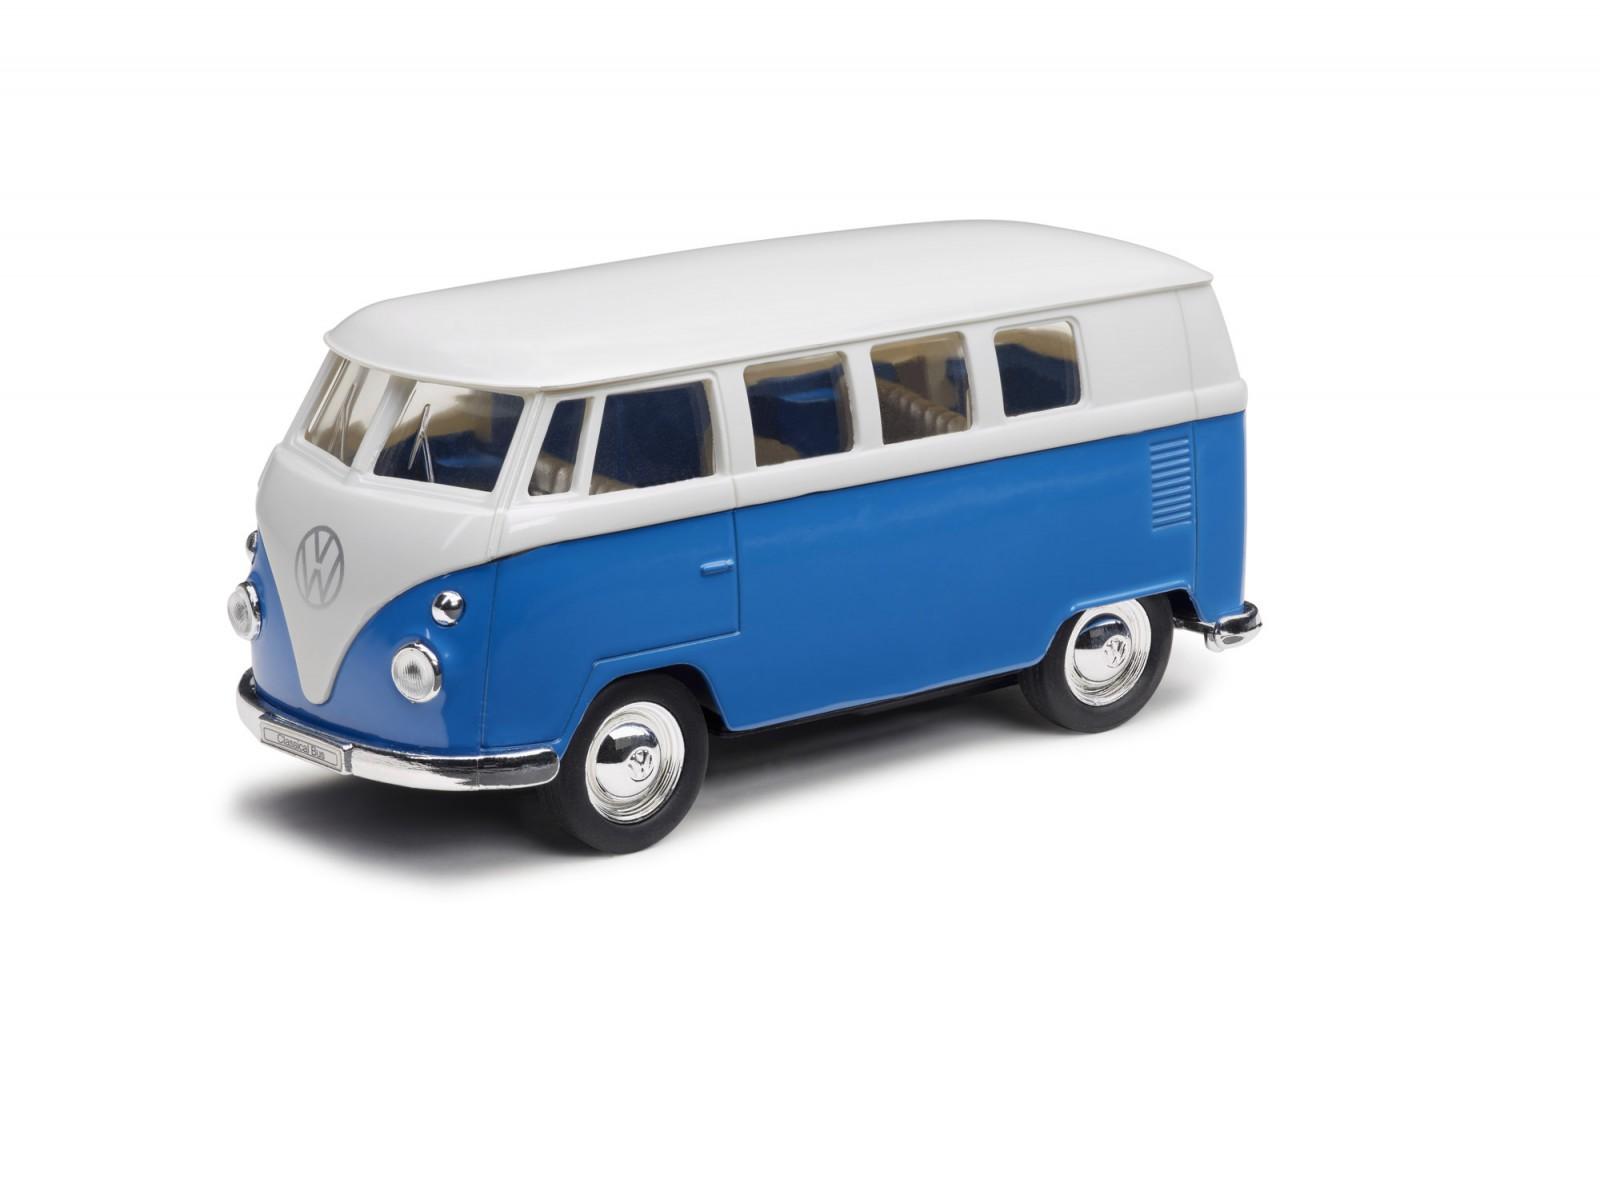 original vw volkswagen t1 bulli modellauto in blau mit. Black Bedroom Furniture Sets. Home Design Ideas